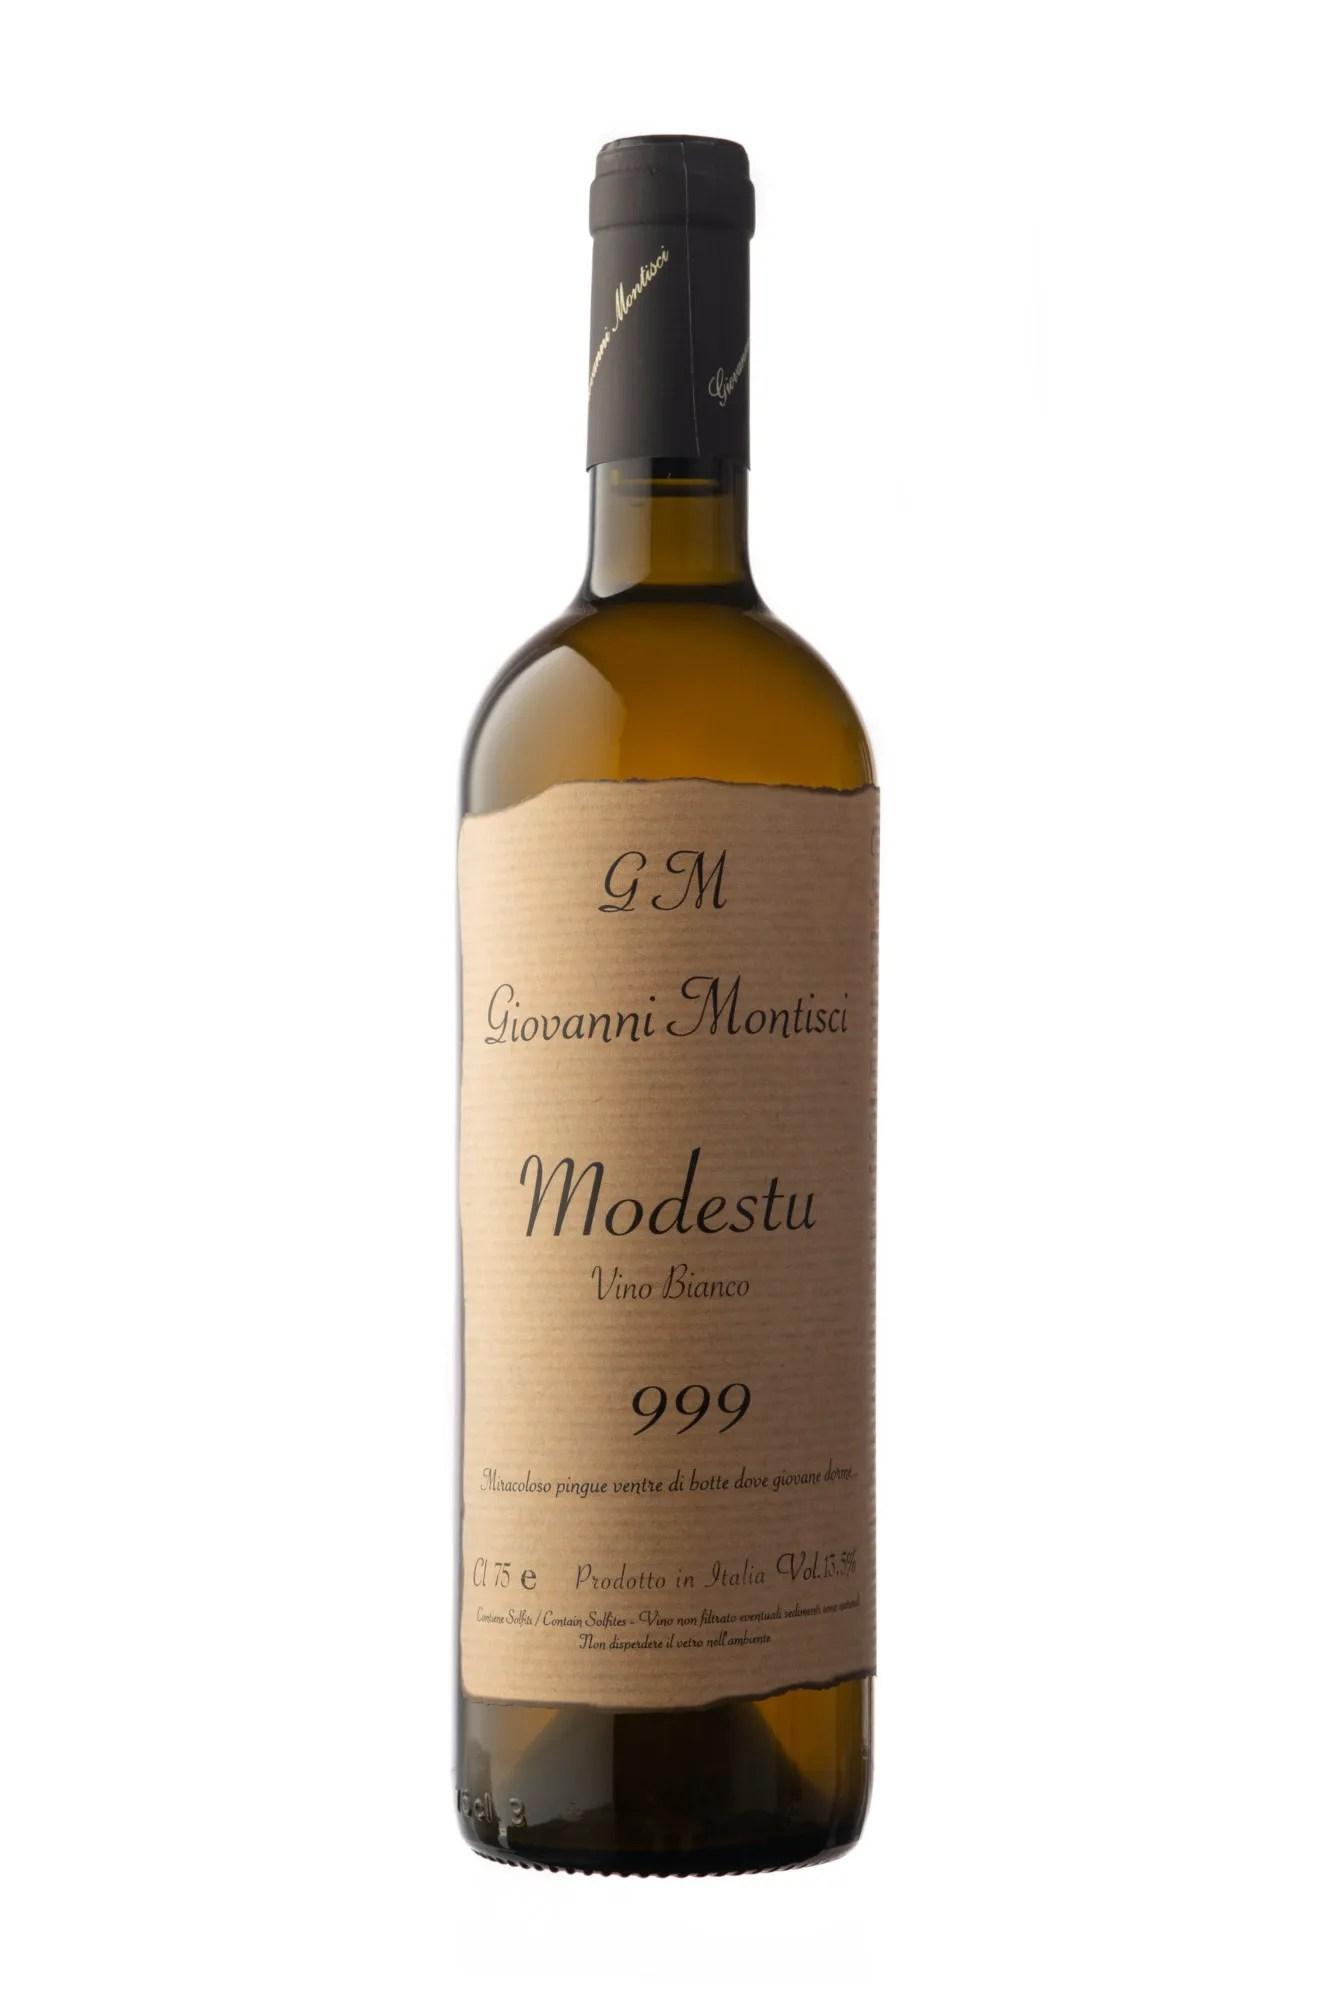 Modestu 999 Vino Bianco